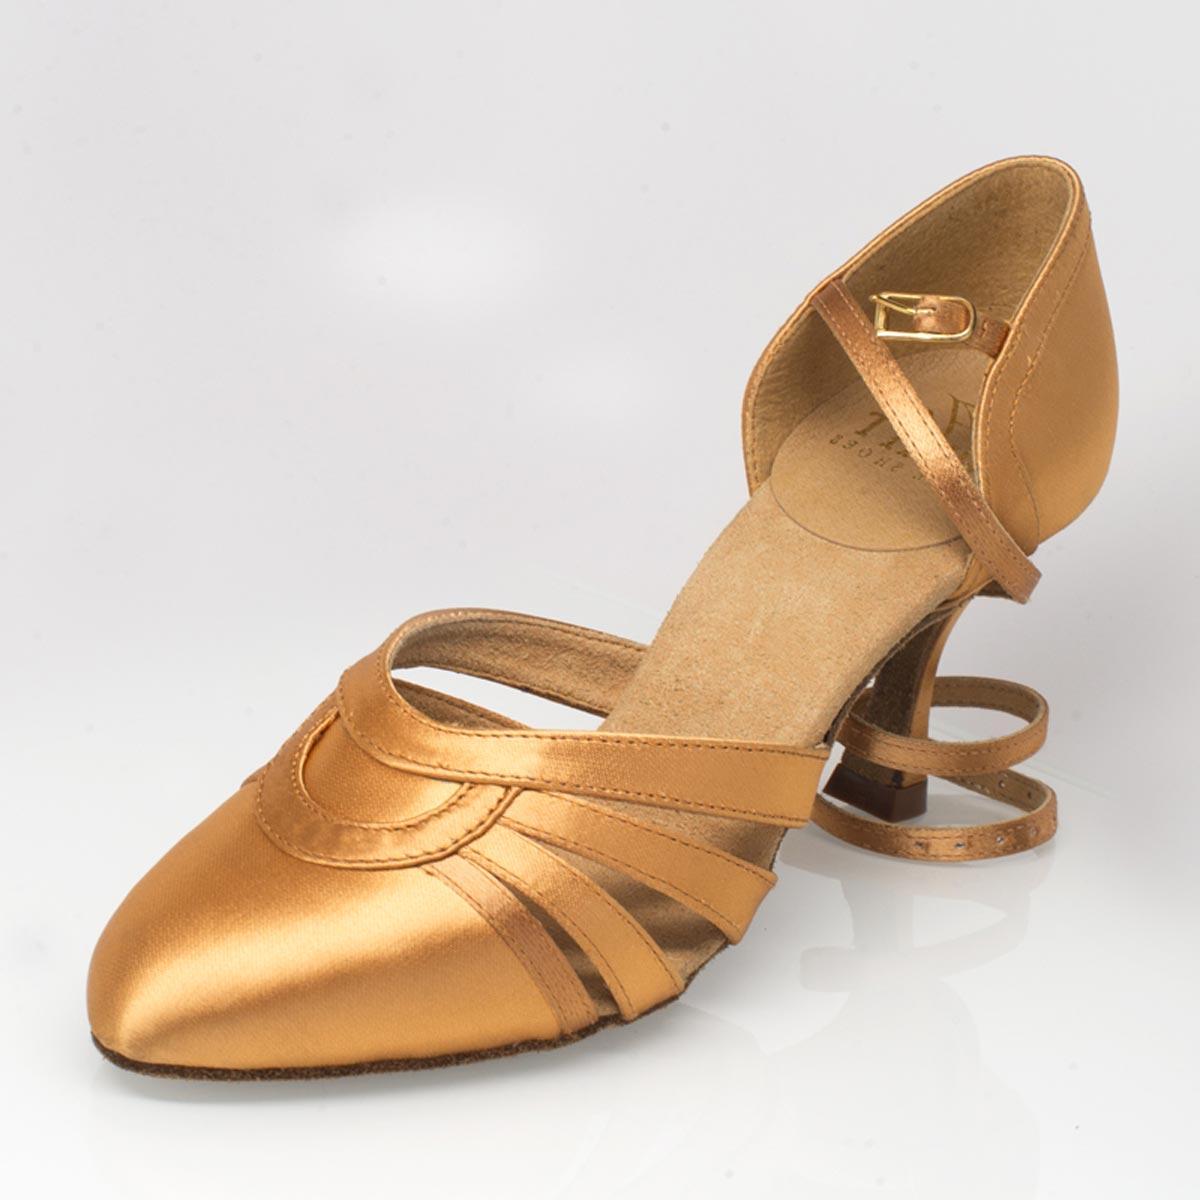 af156c77026b Ray Rose - Ladies Dance Shoes 104 Nevada - Flesh Satin